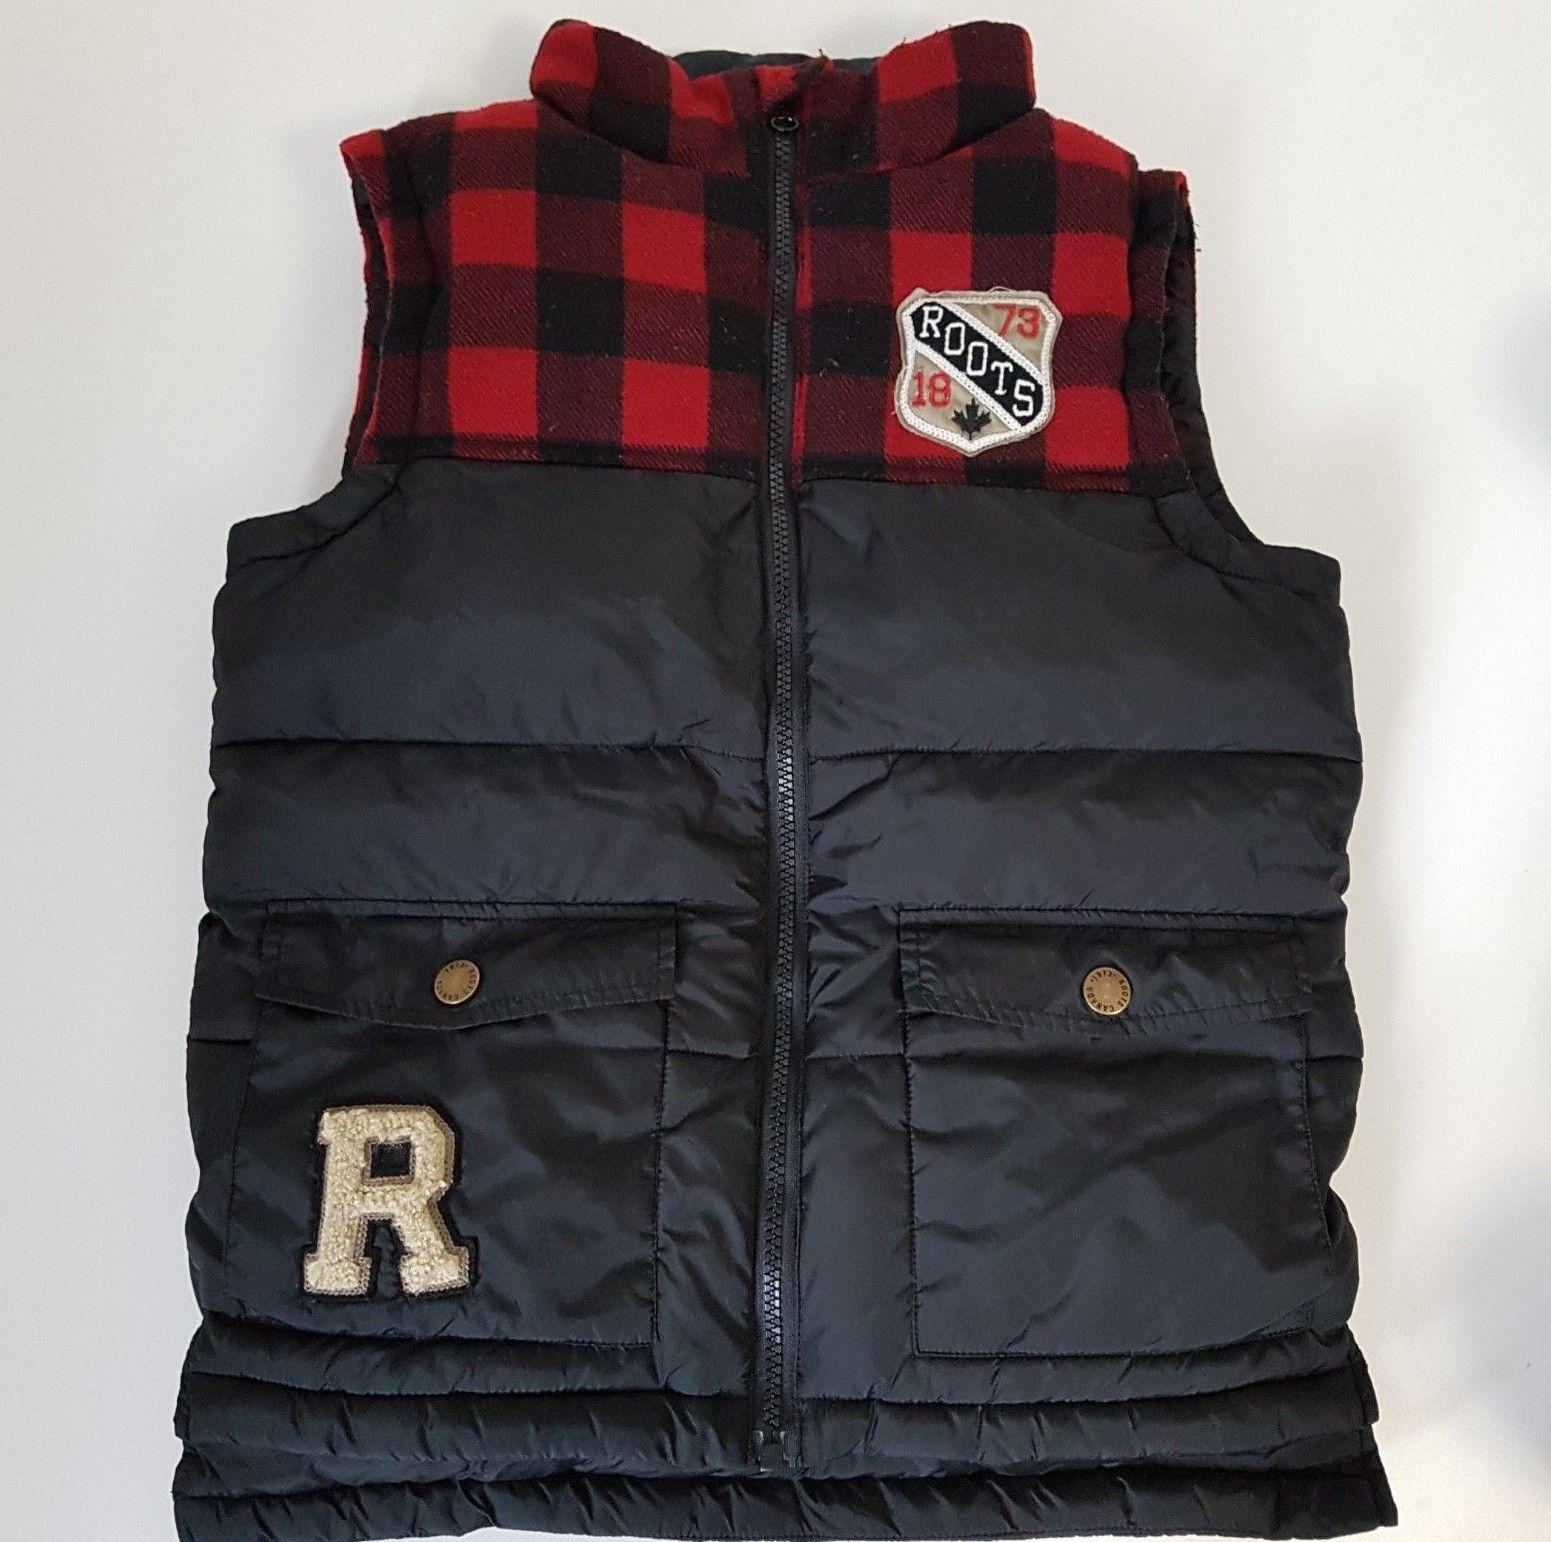 41ece521a Roots Canada Kids Winter Puffer Vest Red Black Checks Ottawa Boy's M ...